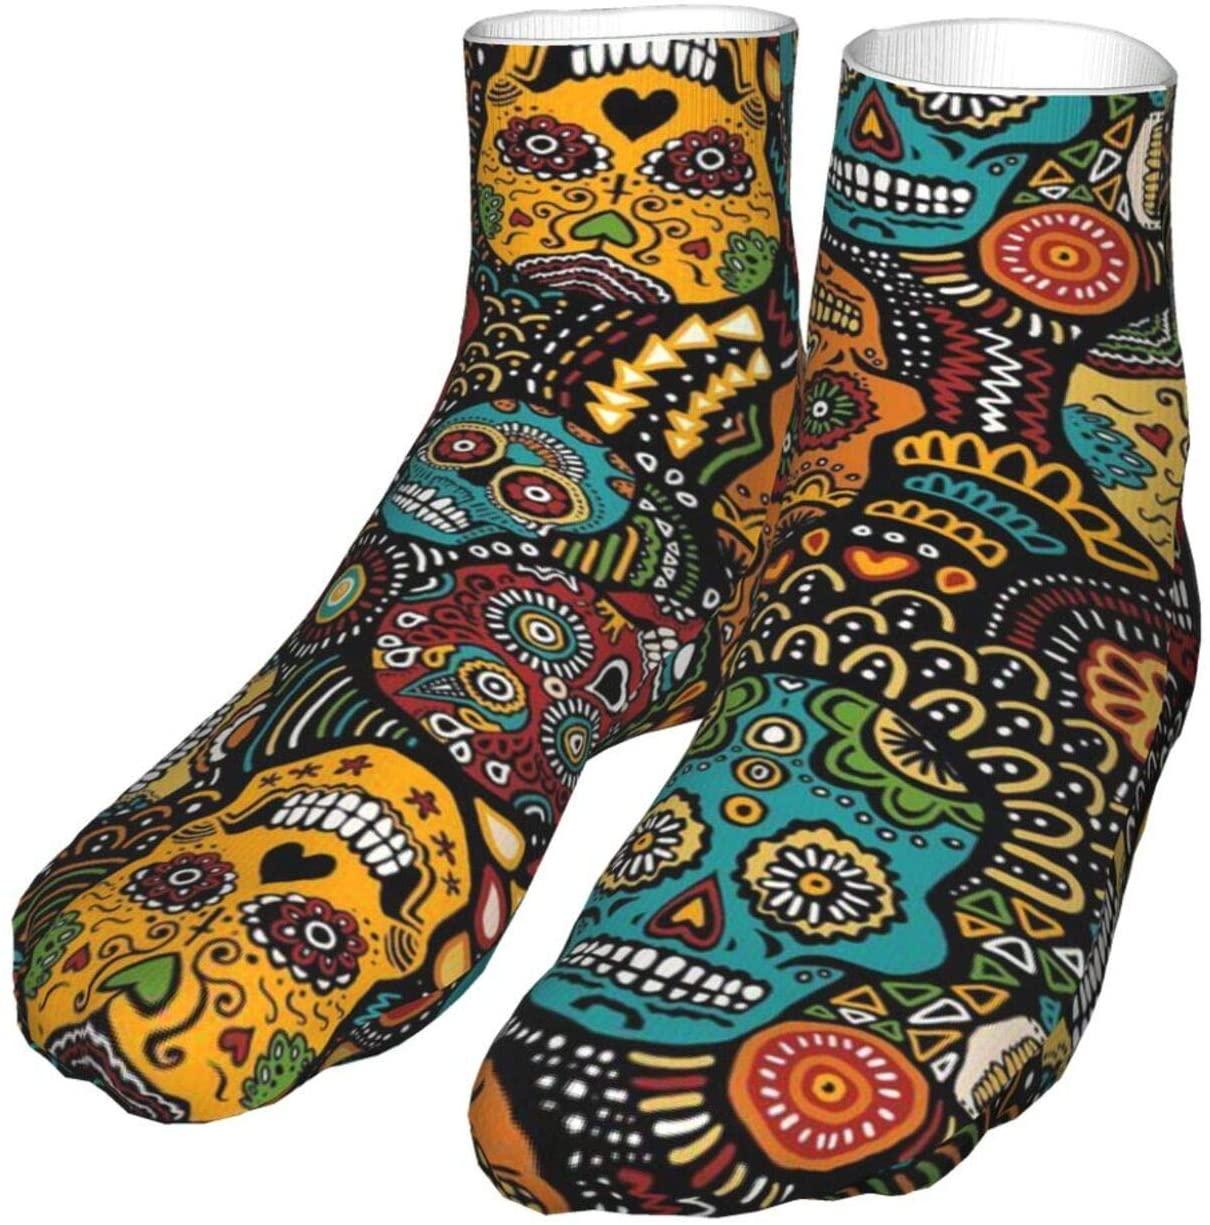 antcreptson Mexican Sugar Skulls Compression Socks for Women & Men 40mmhg-Pvendor Athletic Nursing Stocking for Running, Flight, Travel, Nurses, Edema Stockings Nursing